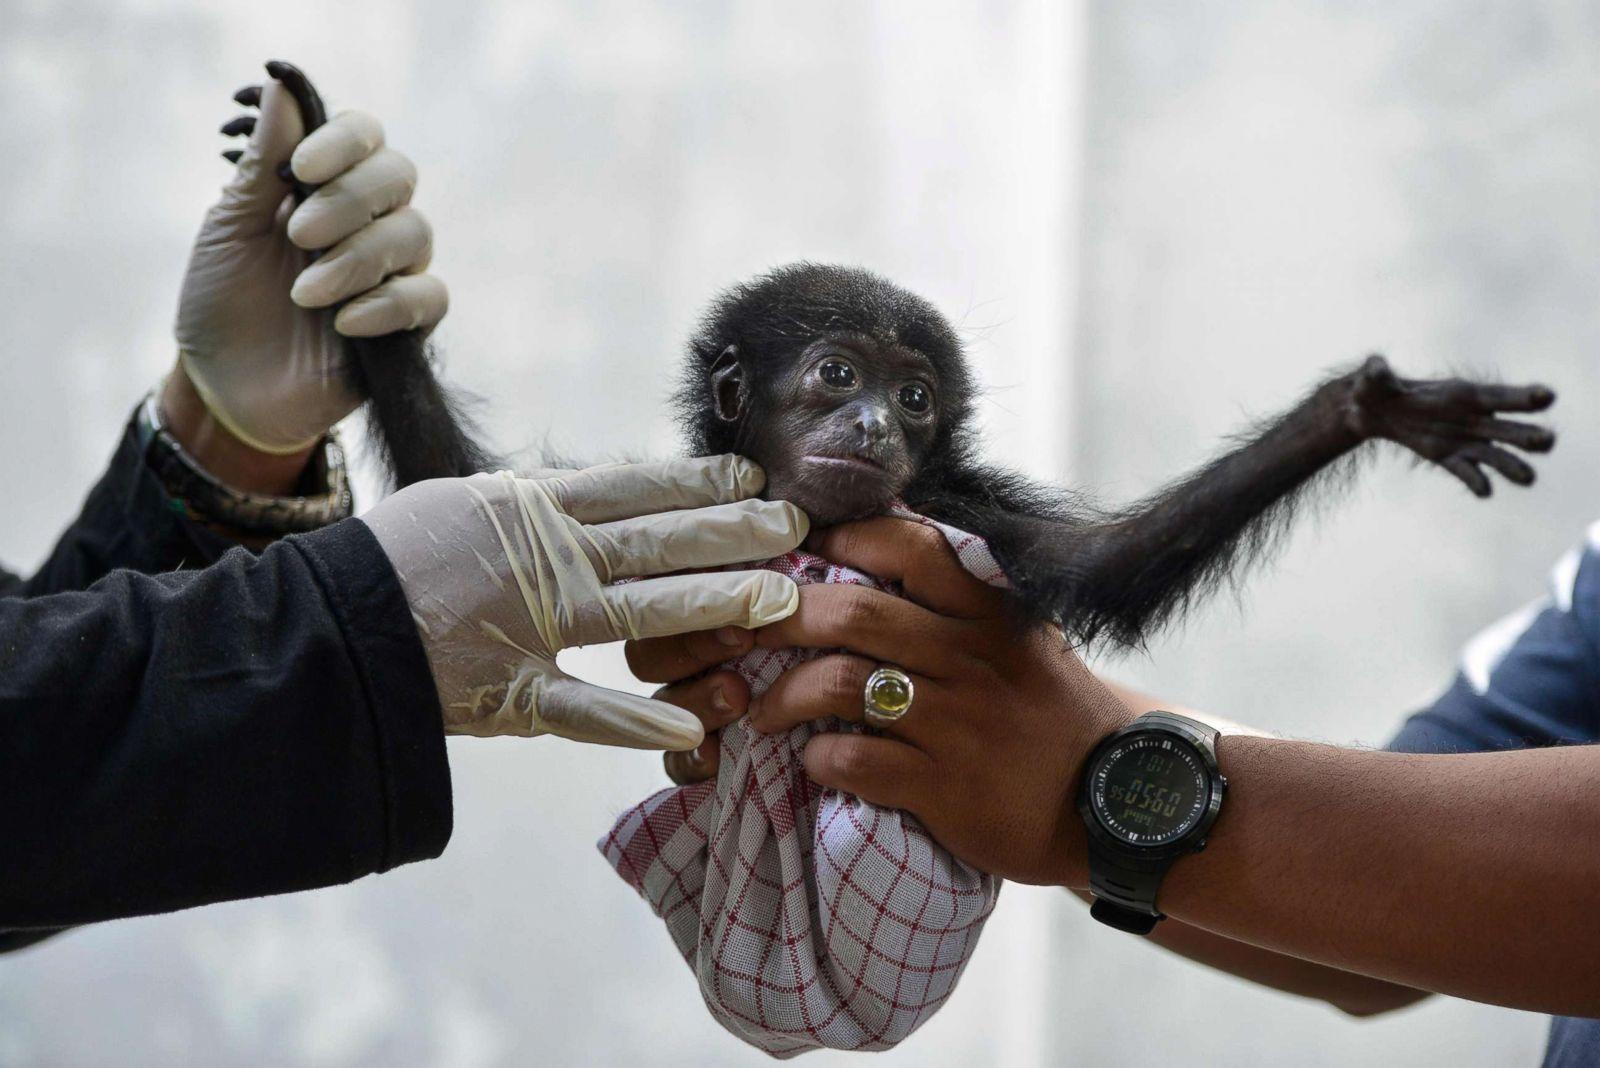 Cutest baby animals from around the world